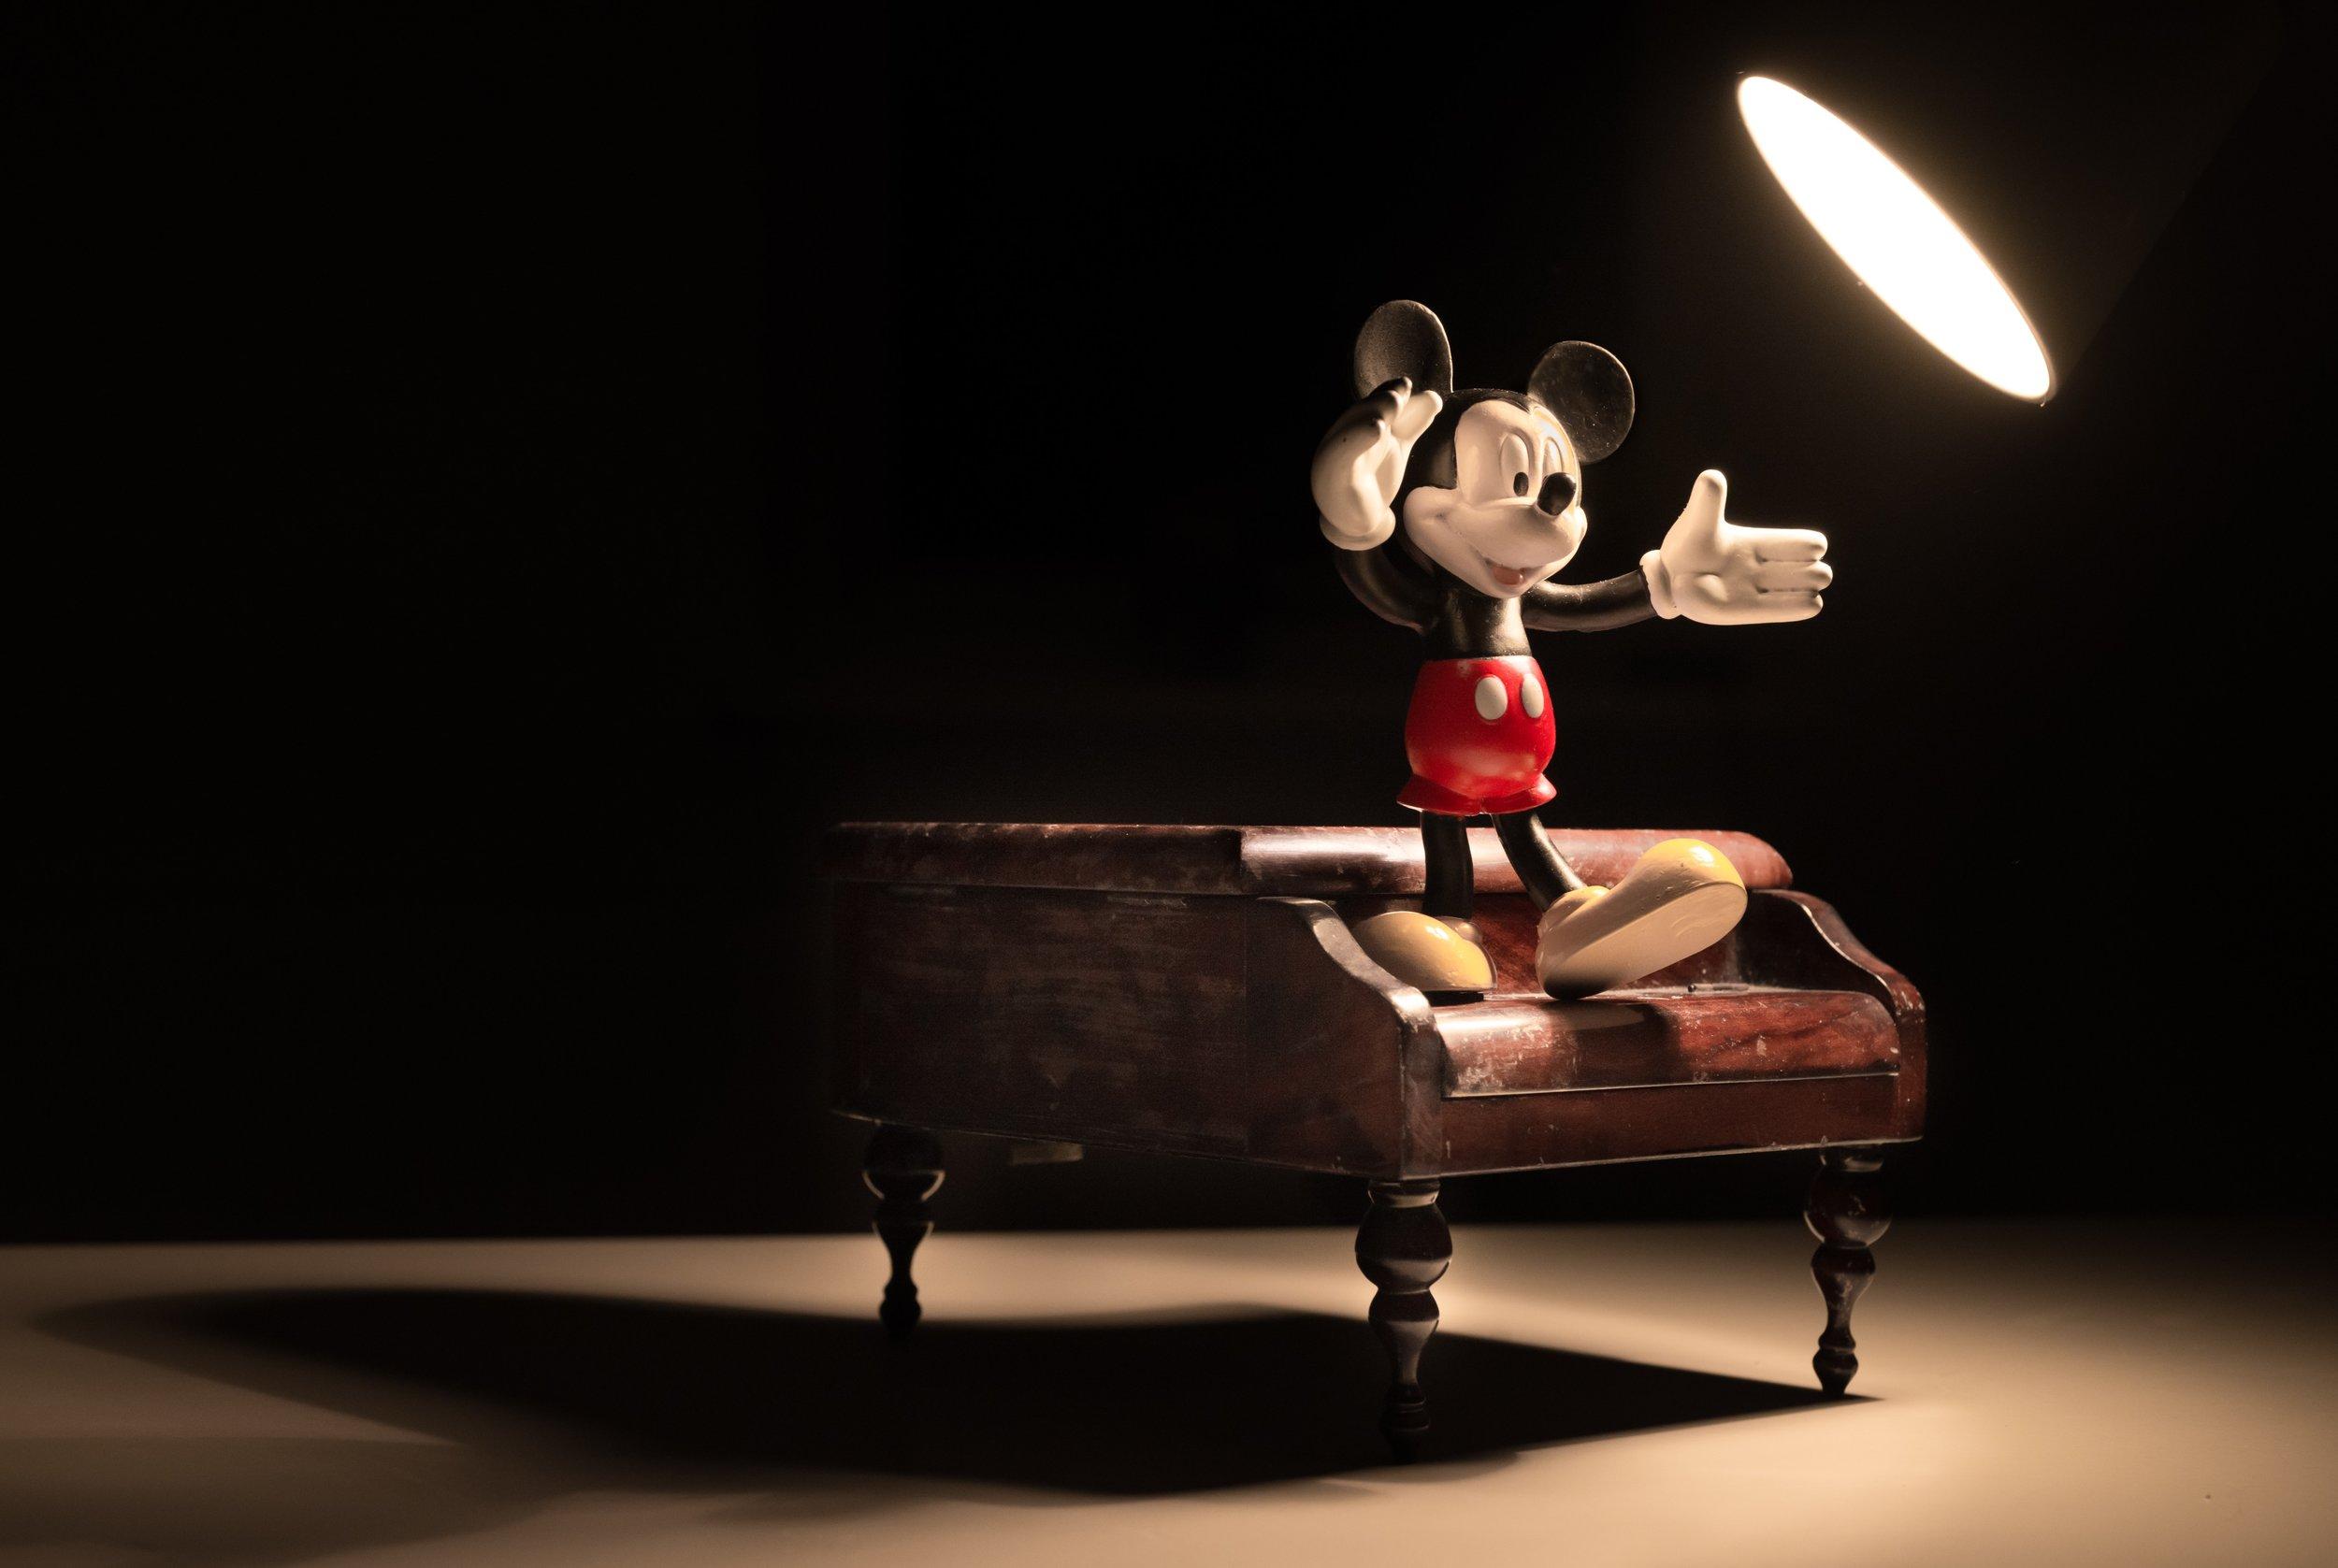 animation-cartoon-cartoon-character-42415.jpg